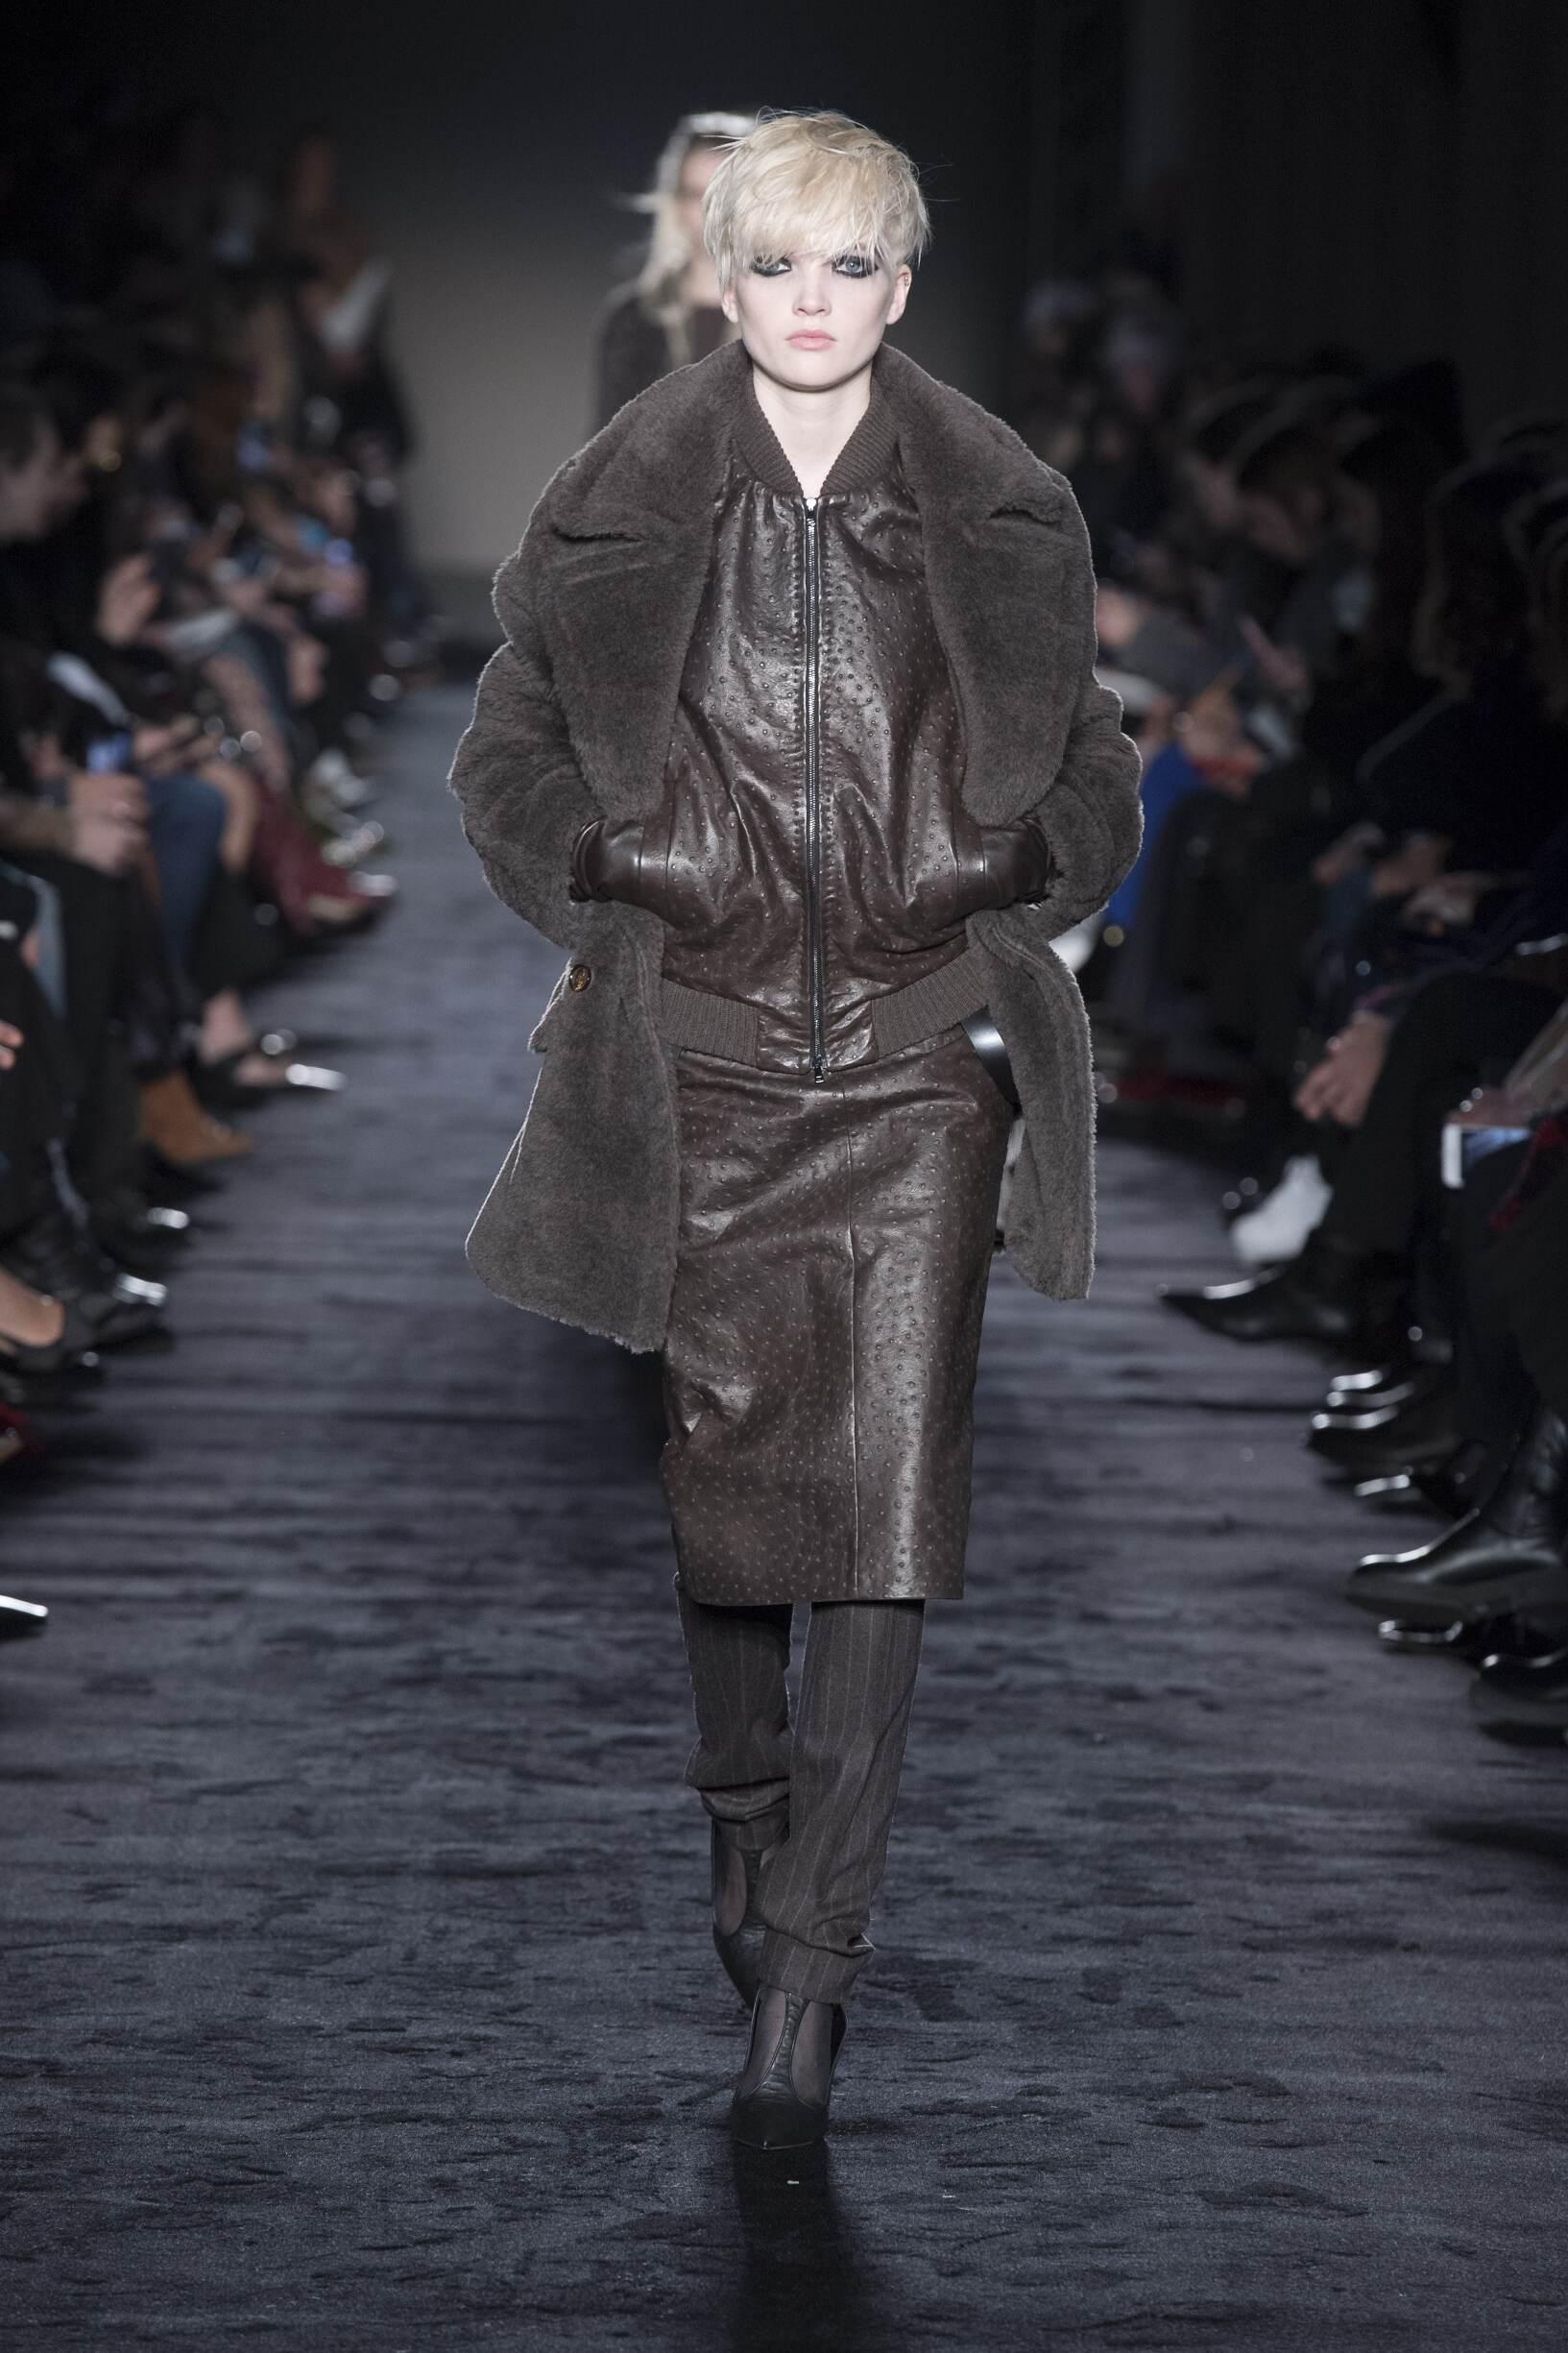 Runway Max Mara Fall Winter 2018 Women's Collection Milan Fashion Week